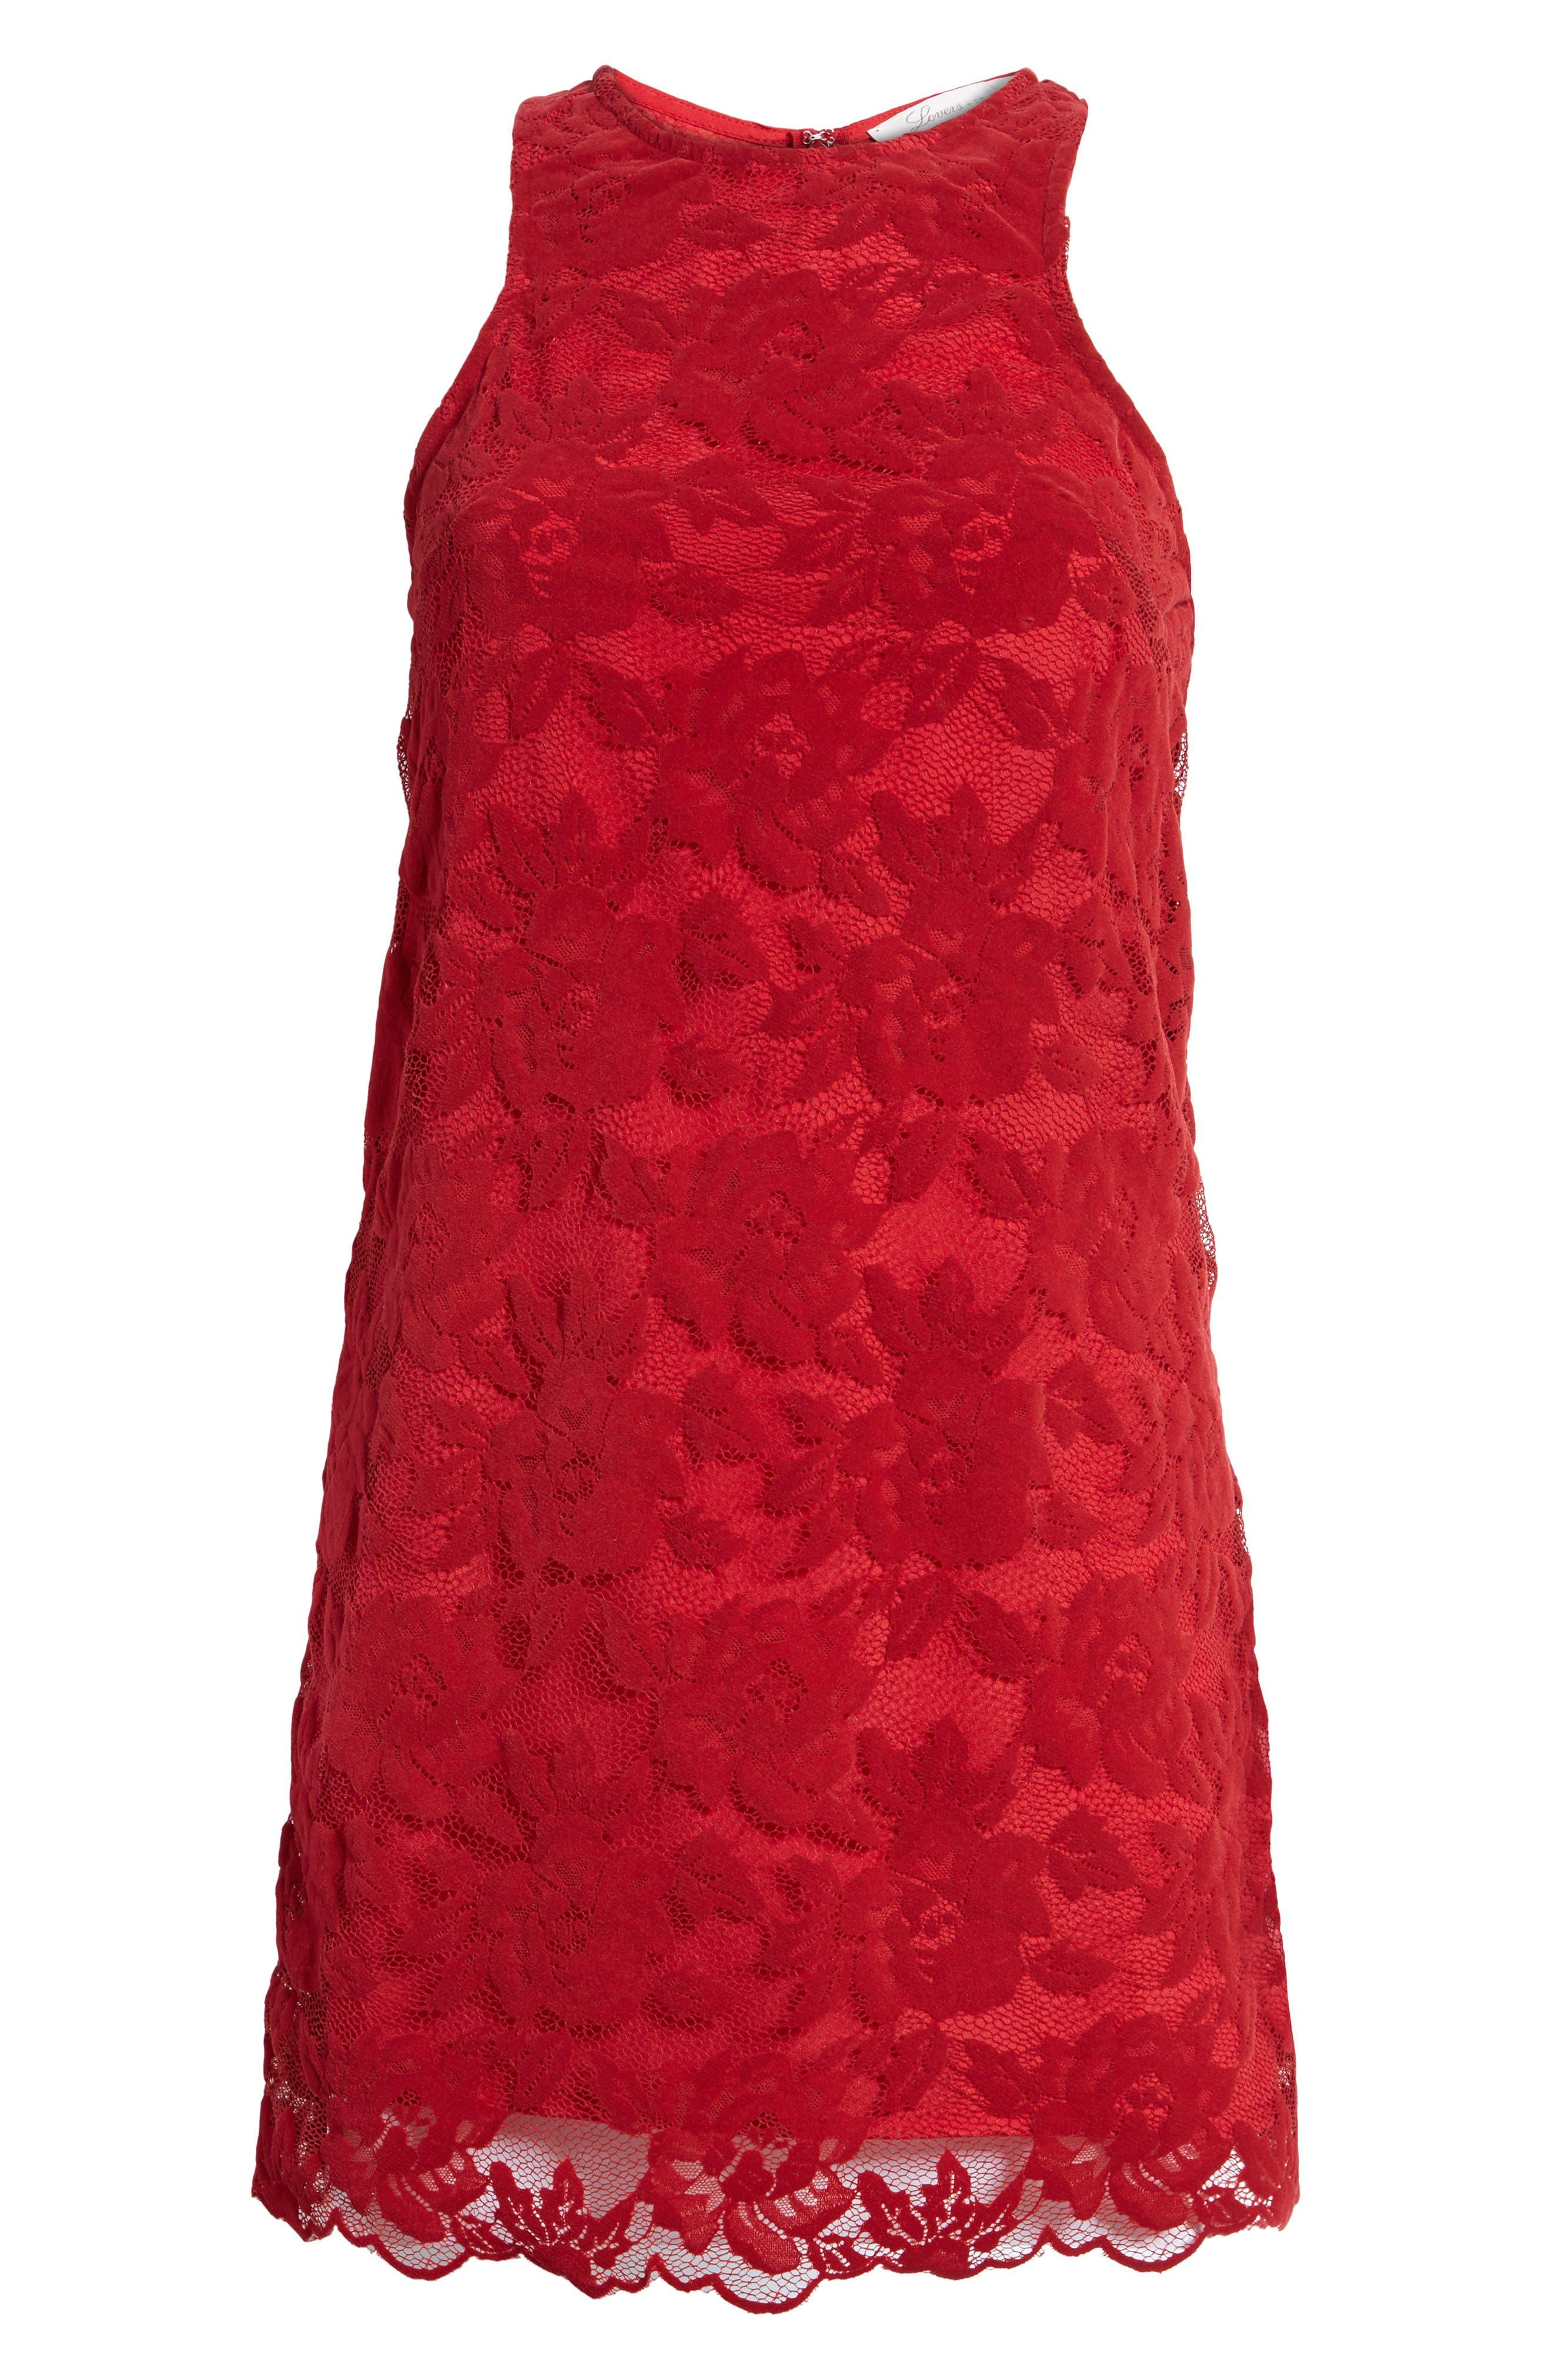 Caspian Lace Sheath Dress,                             Alternate thumbnail 6, color,